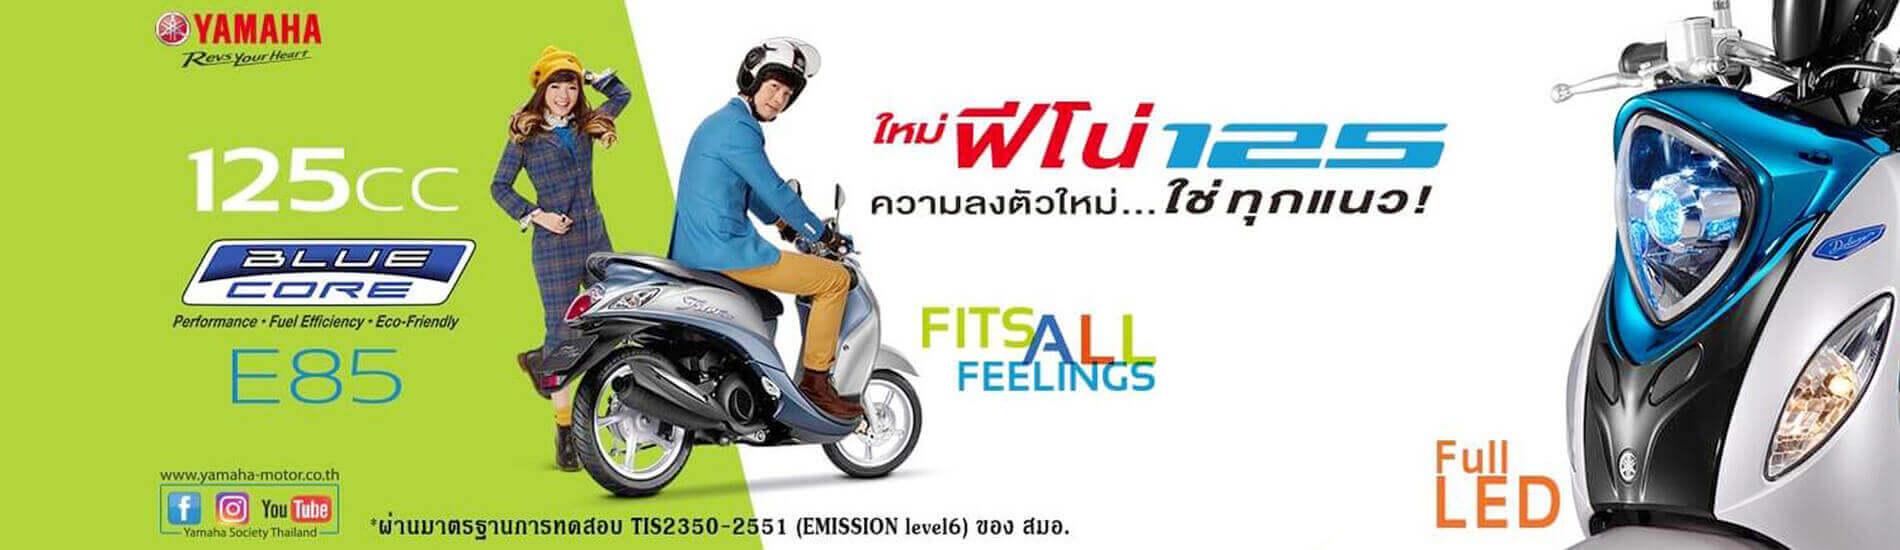 Yamaha Fino 125 2015